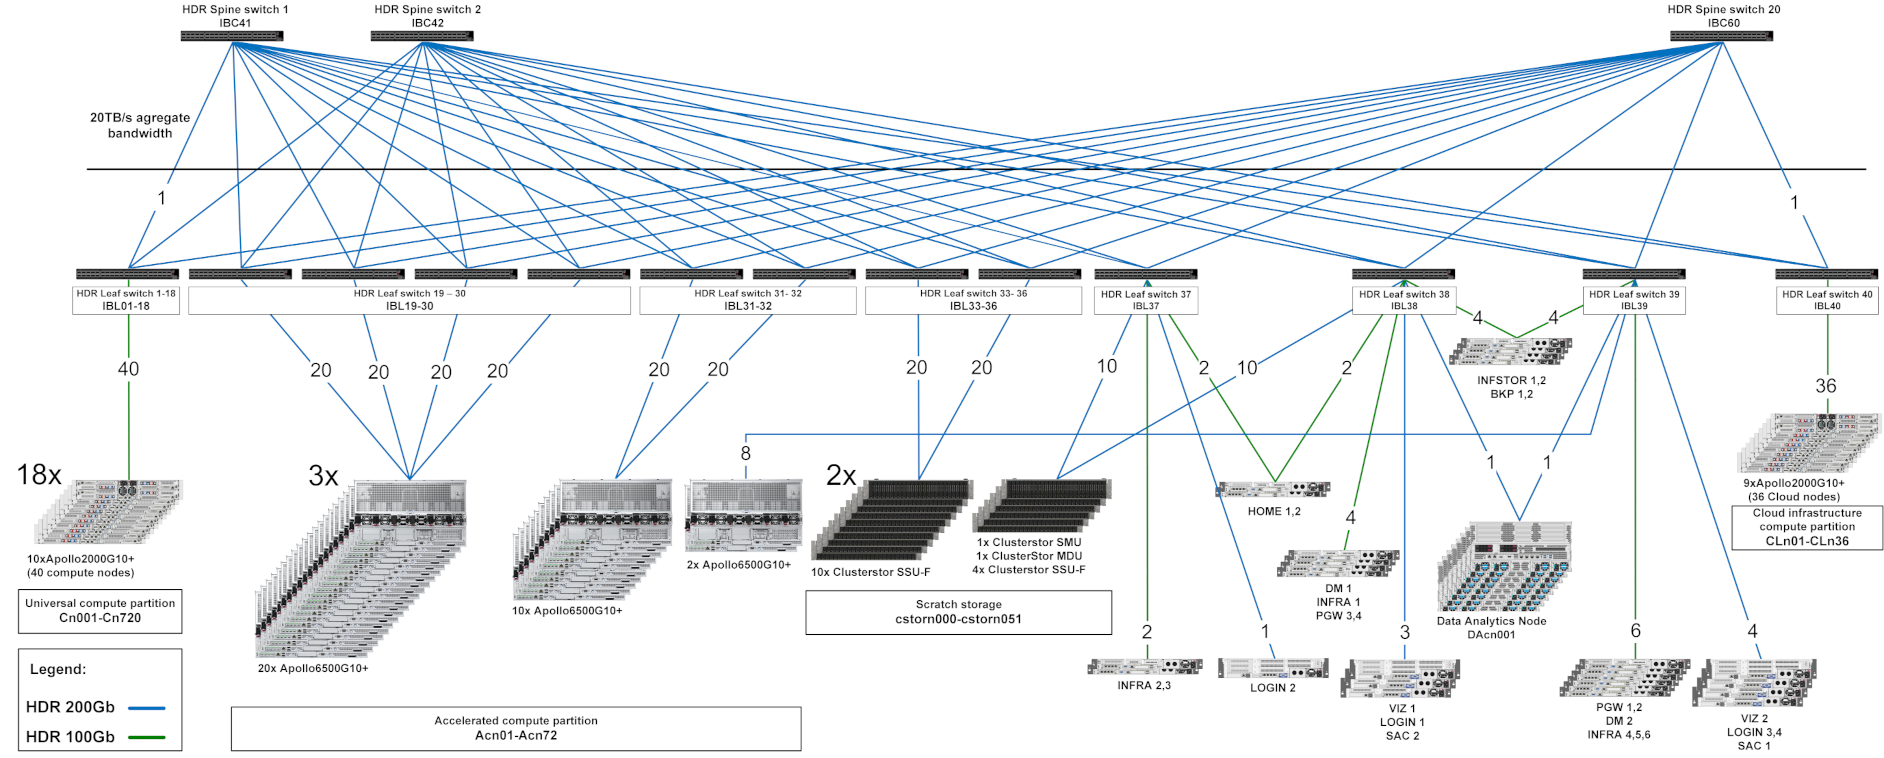 docs.it4i/karolina/img/compute_network_topology_v2.png